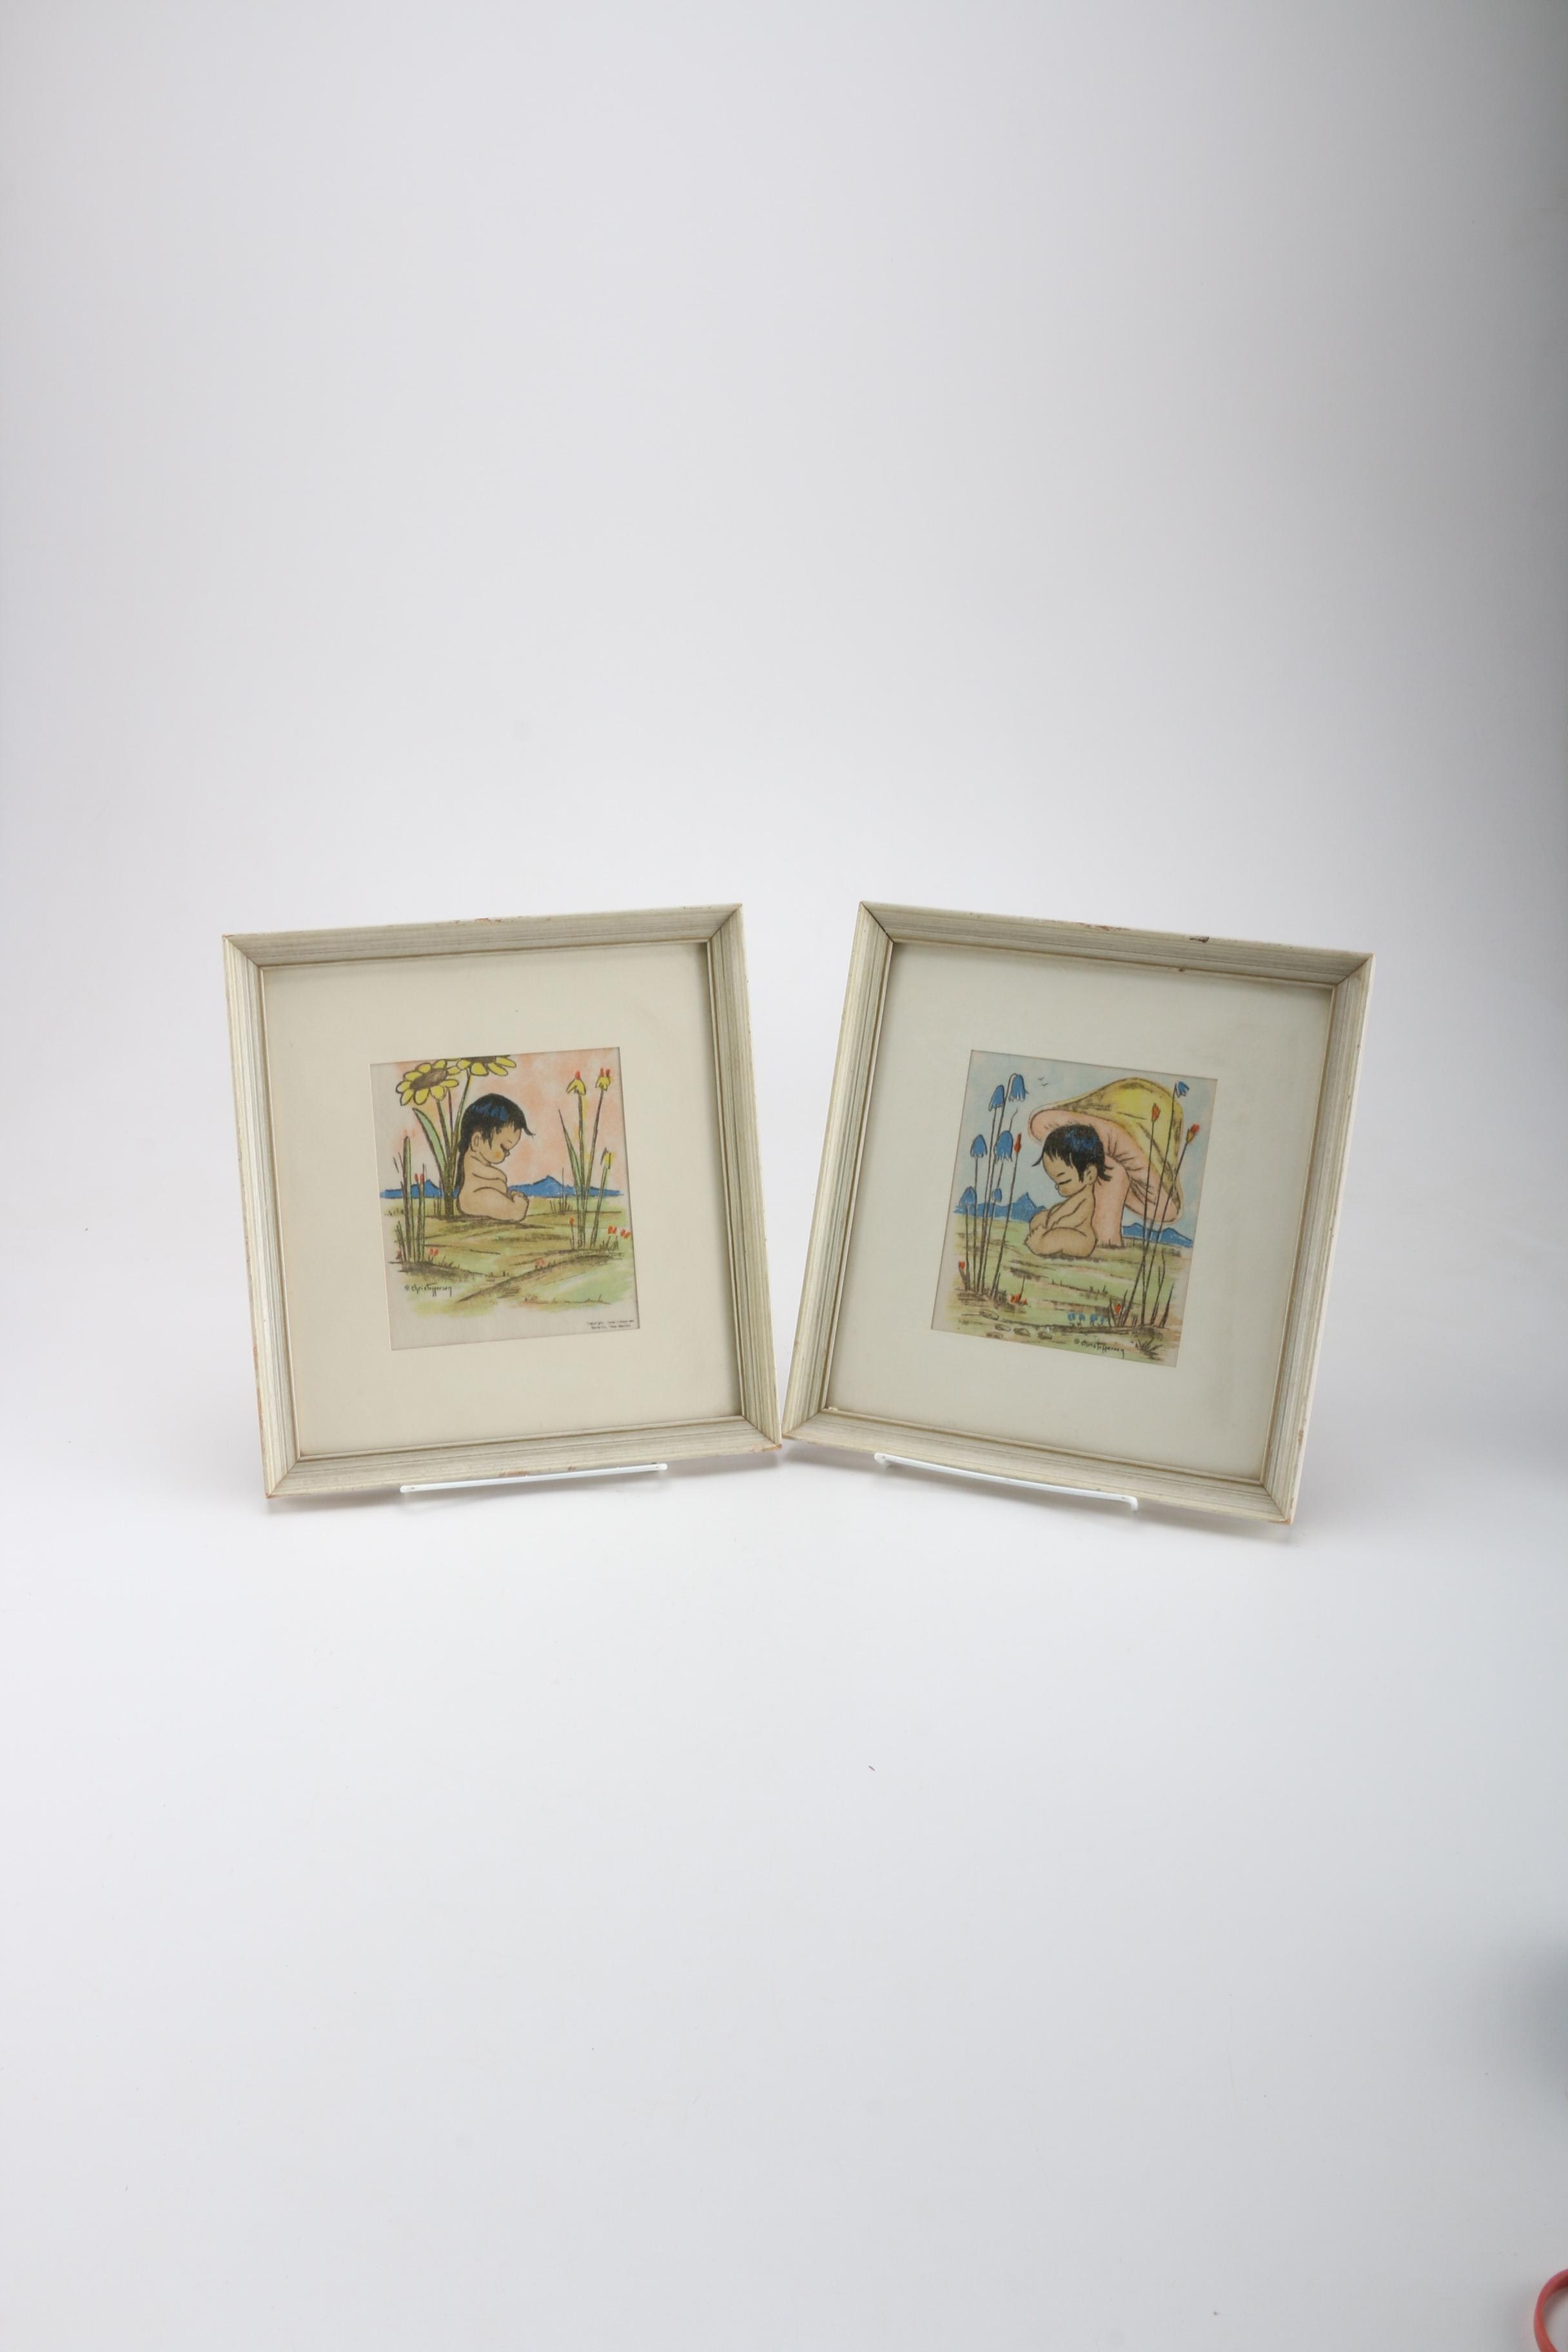 Chris Topperson Framed Offset Lithographs of Children